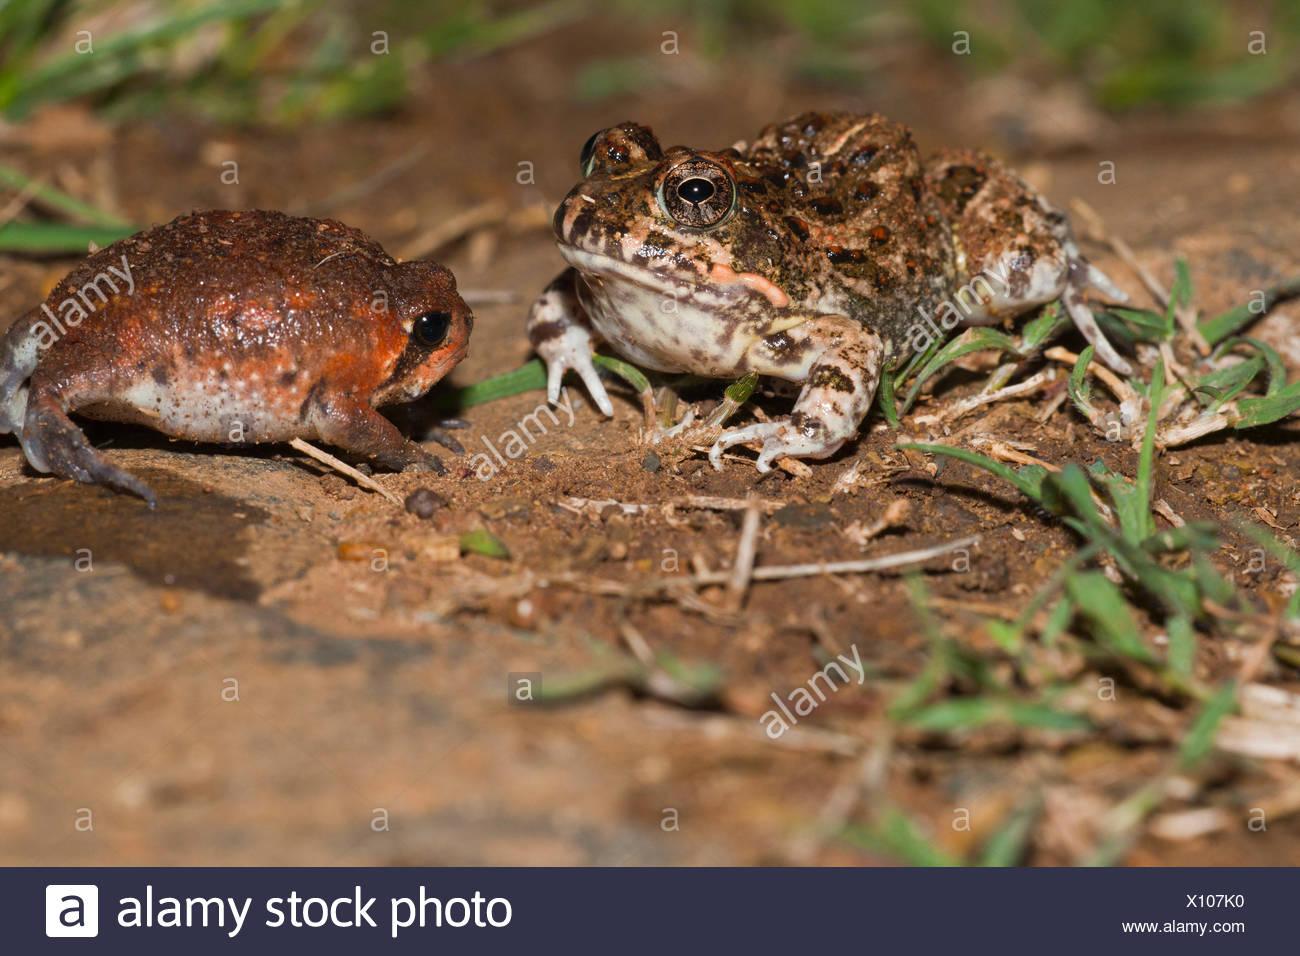 Tremolo Sand Frog, juvenile, and Bushveld Rain Frog, juvenile, blown up for defence, Hidden Valley, KwaZulu-Natal, South Africa / (Tomopterna cryptotus), (Breviceps adspersus) - Stock Image